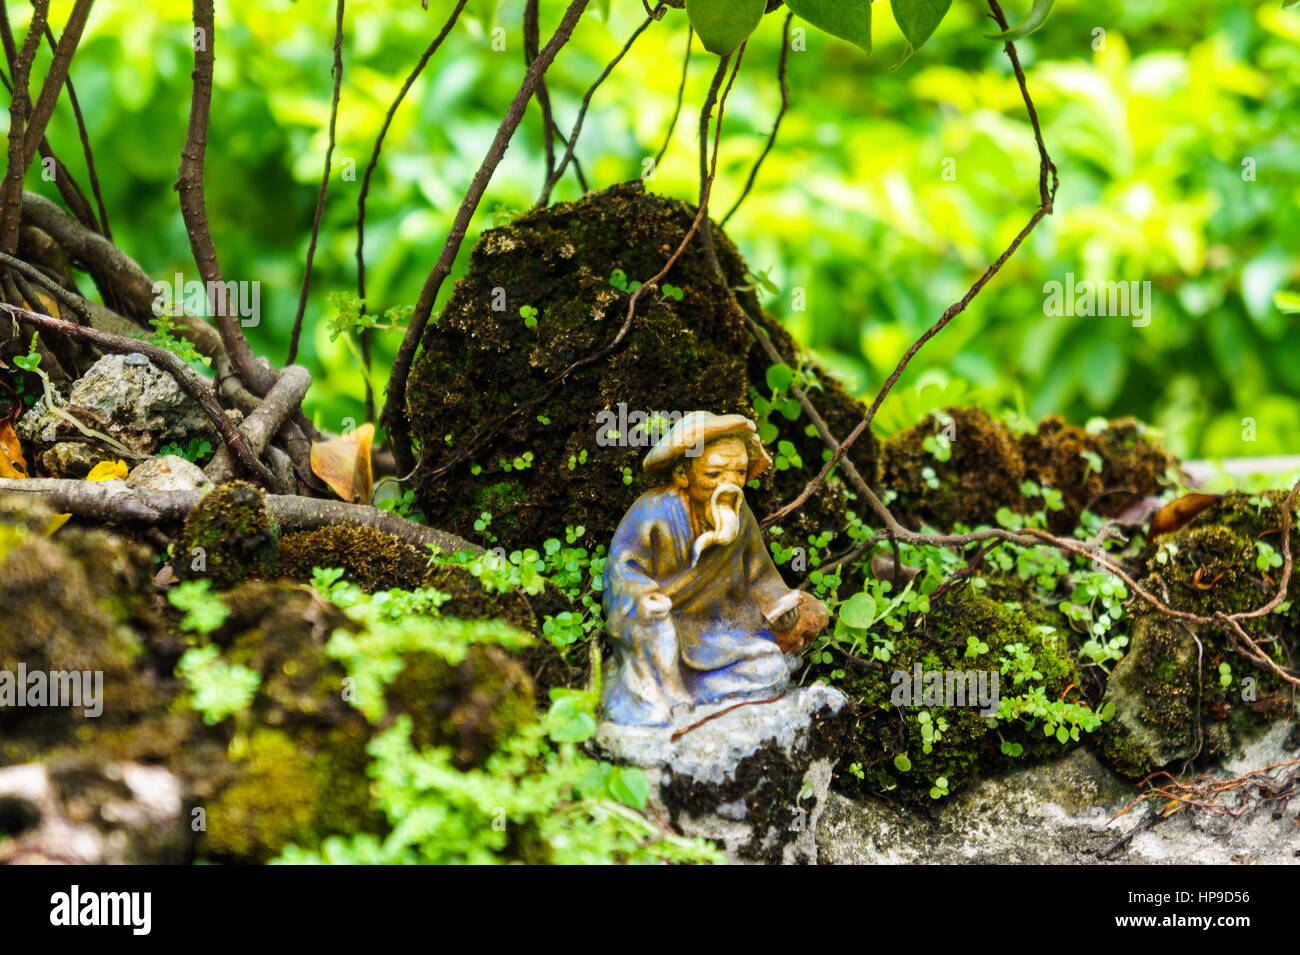 Green Bonsai Tree In Garden Statue Of A Monk Old Figurine Stock Photo Alamy